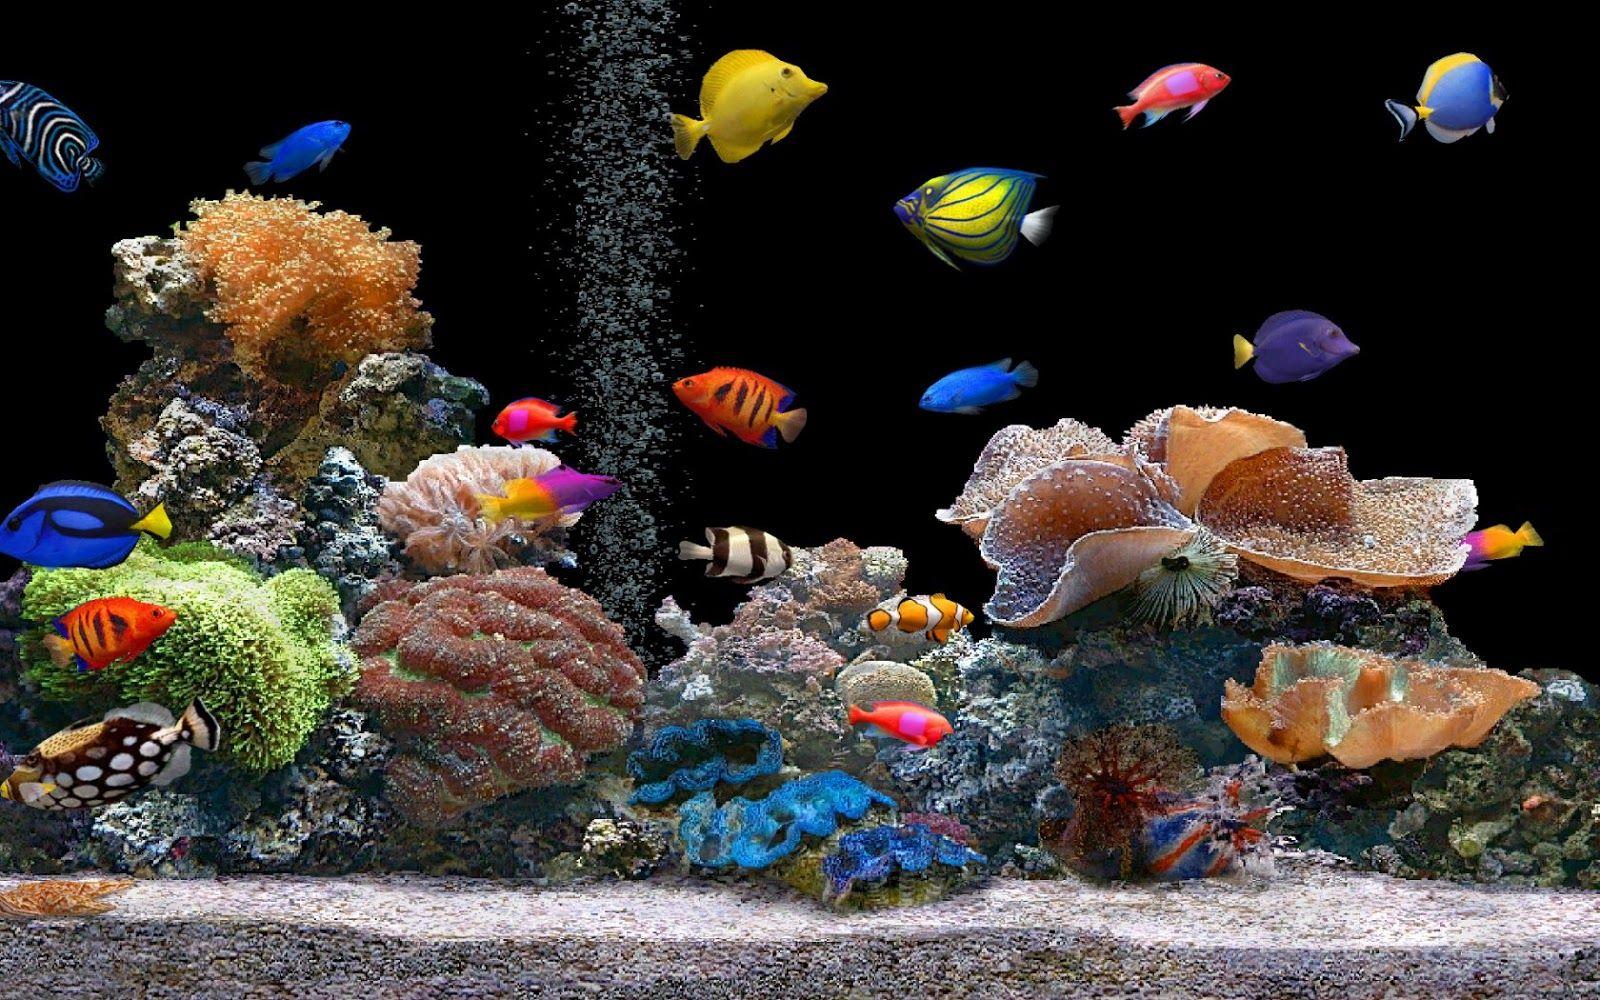 Free Download Aquarium Live Wallpaper For Pc U2013 Aquarium Image Idea Fish Wallpaper Aquarium Live Wallpaper Saltwater Fish Tanks